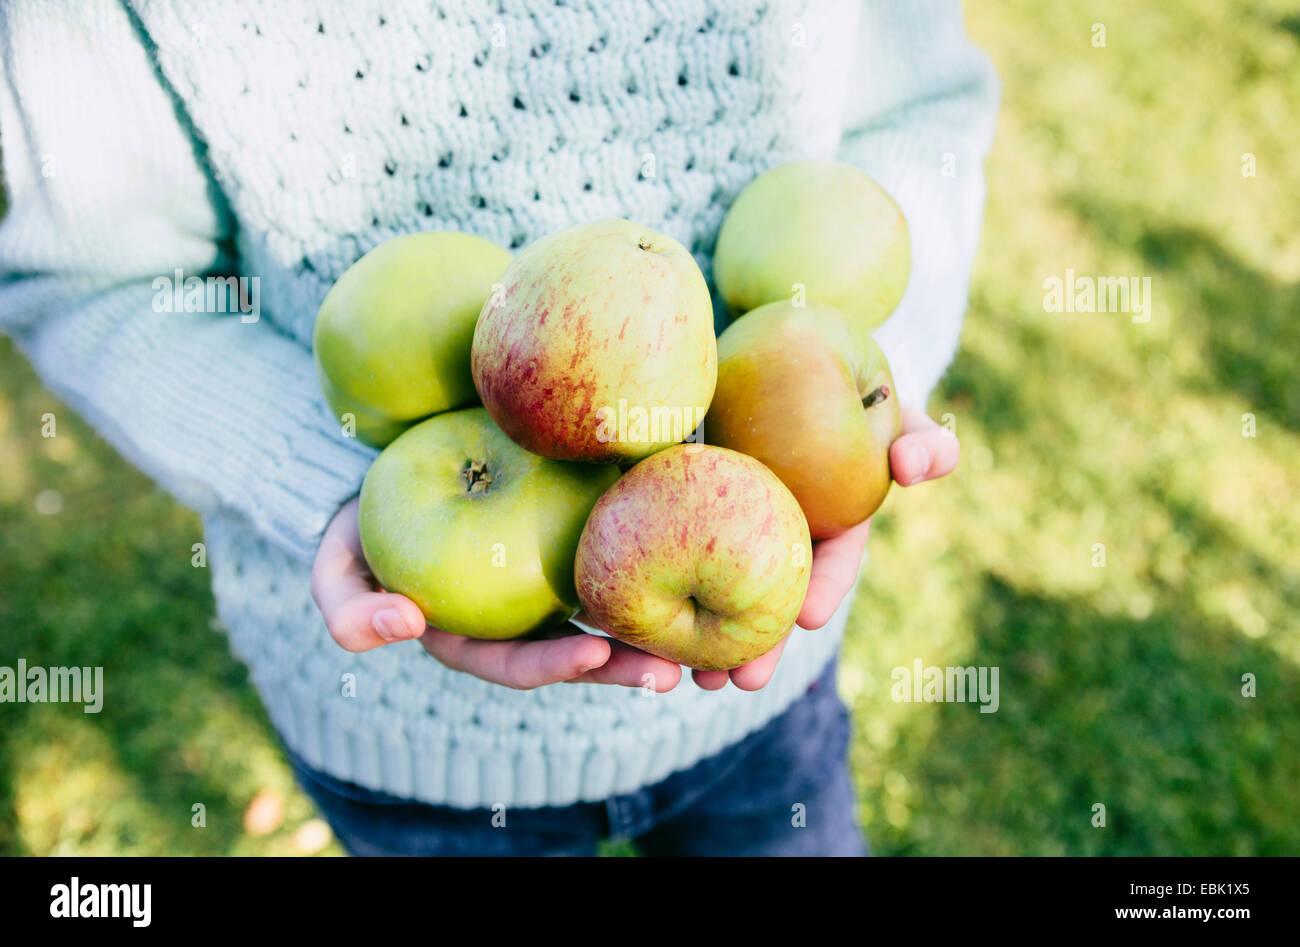 Mädchen in Händen hält, einheimische Äpfel Stockbild